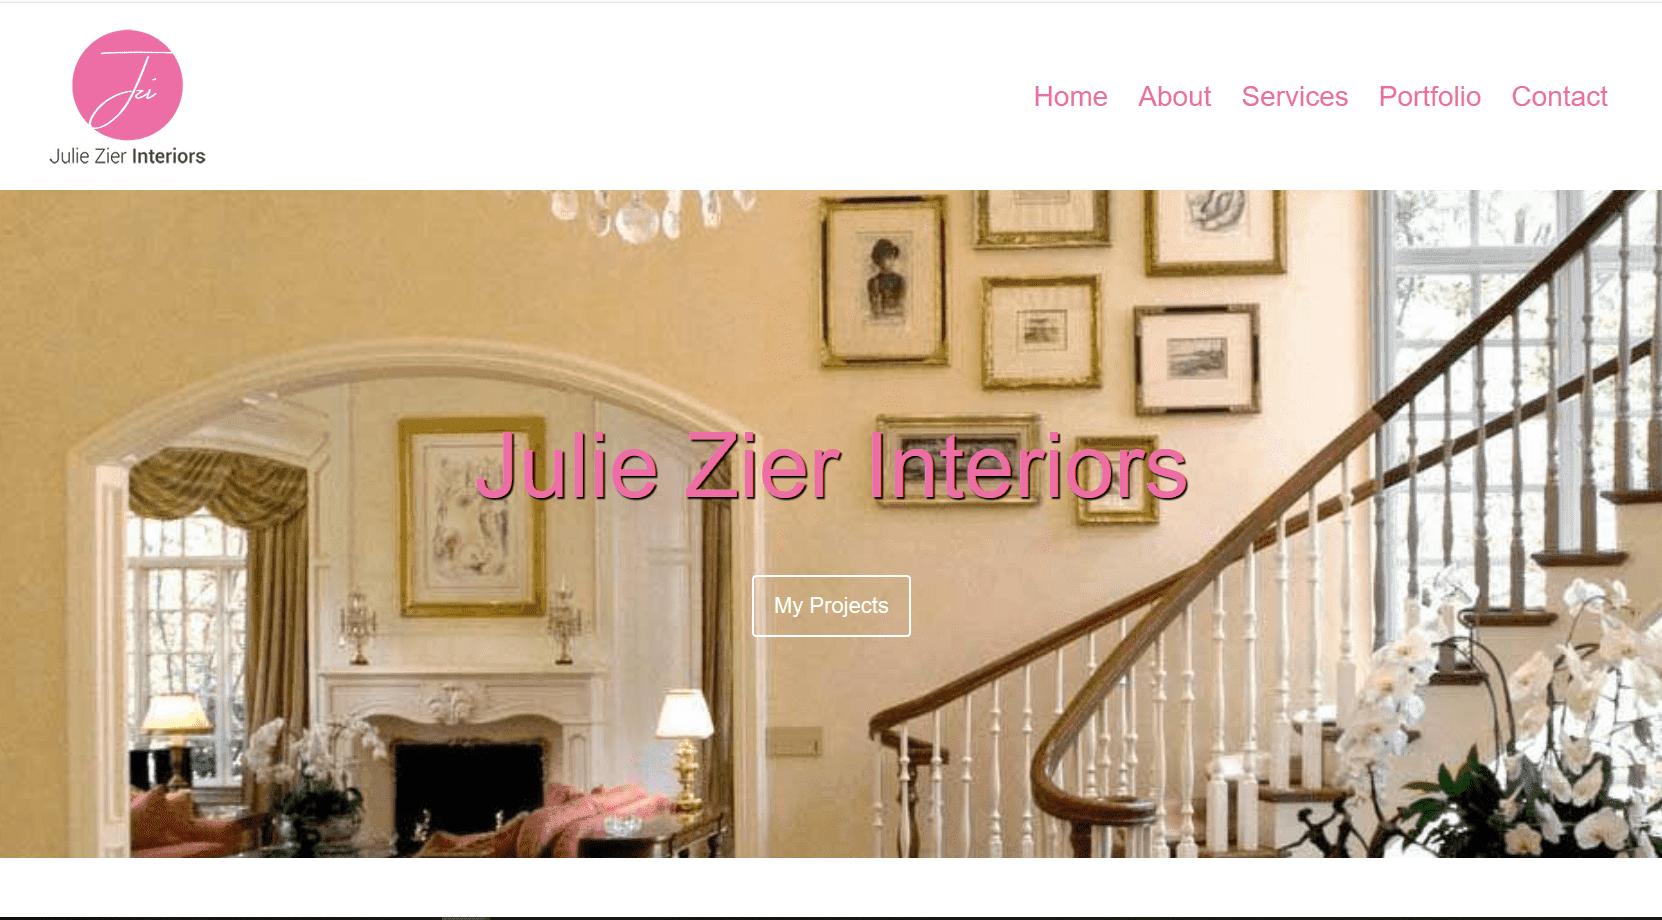 Julie Zier Interiors